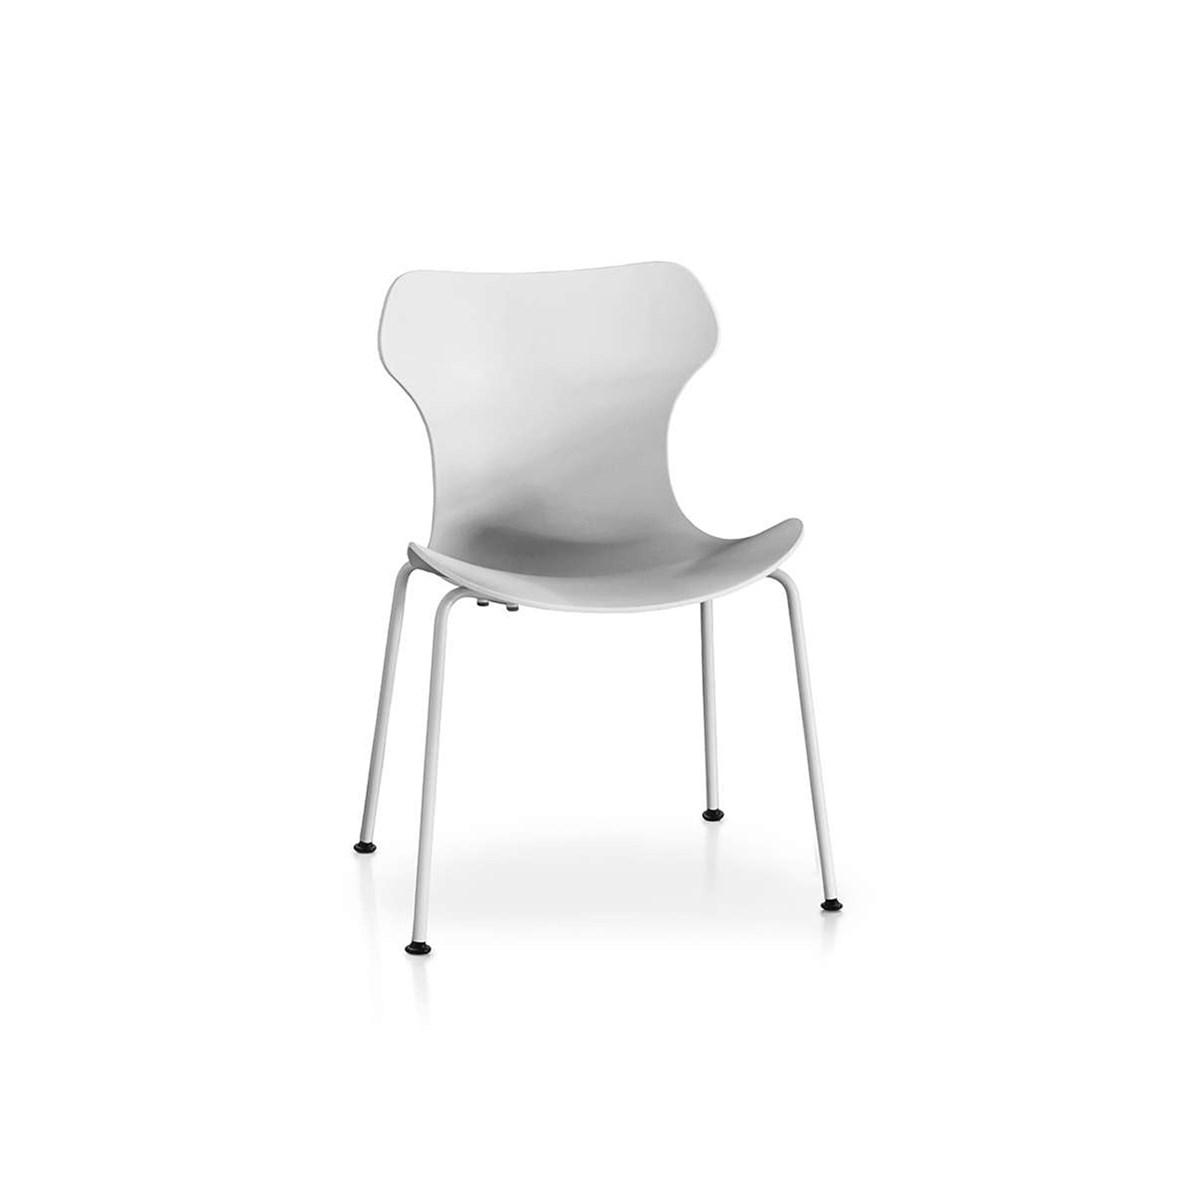 B&B-Italia-Naoto-Fukasawa-Papilio-Shell-Outdoor-Chair-Matisse-1 (1)